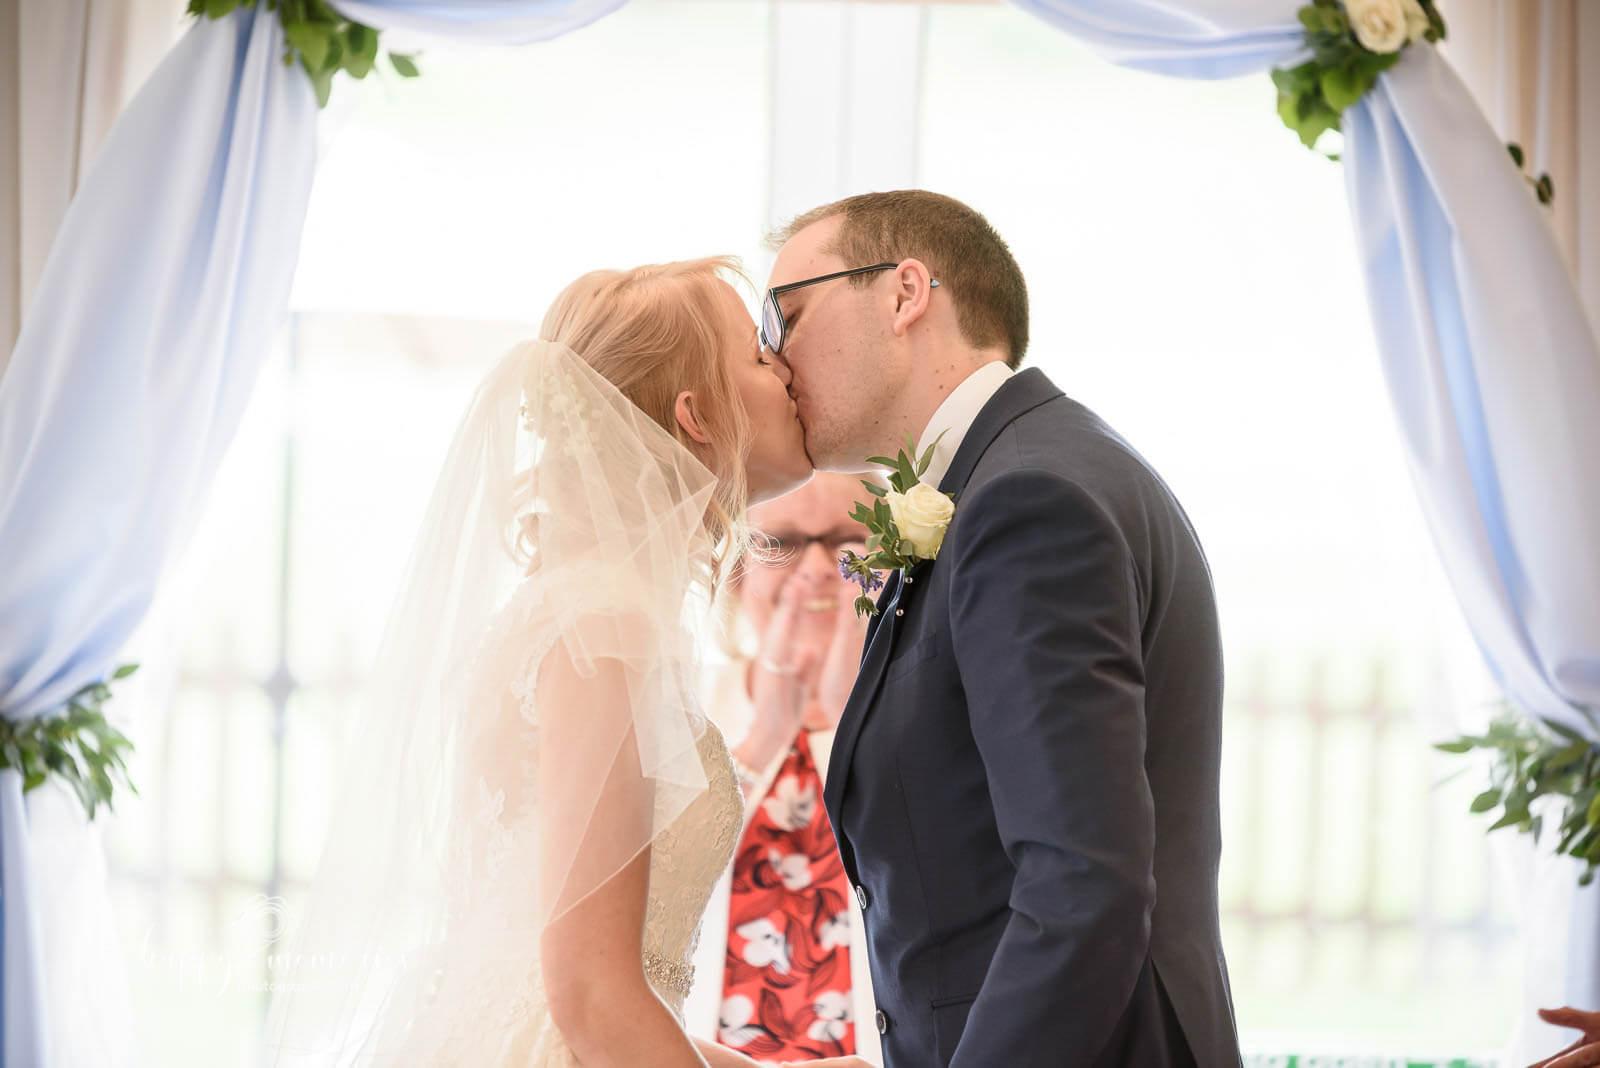 Wedding photographer East Grinstead-26